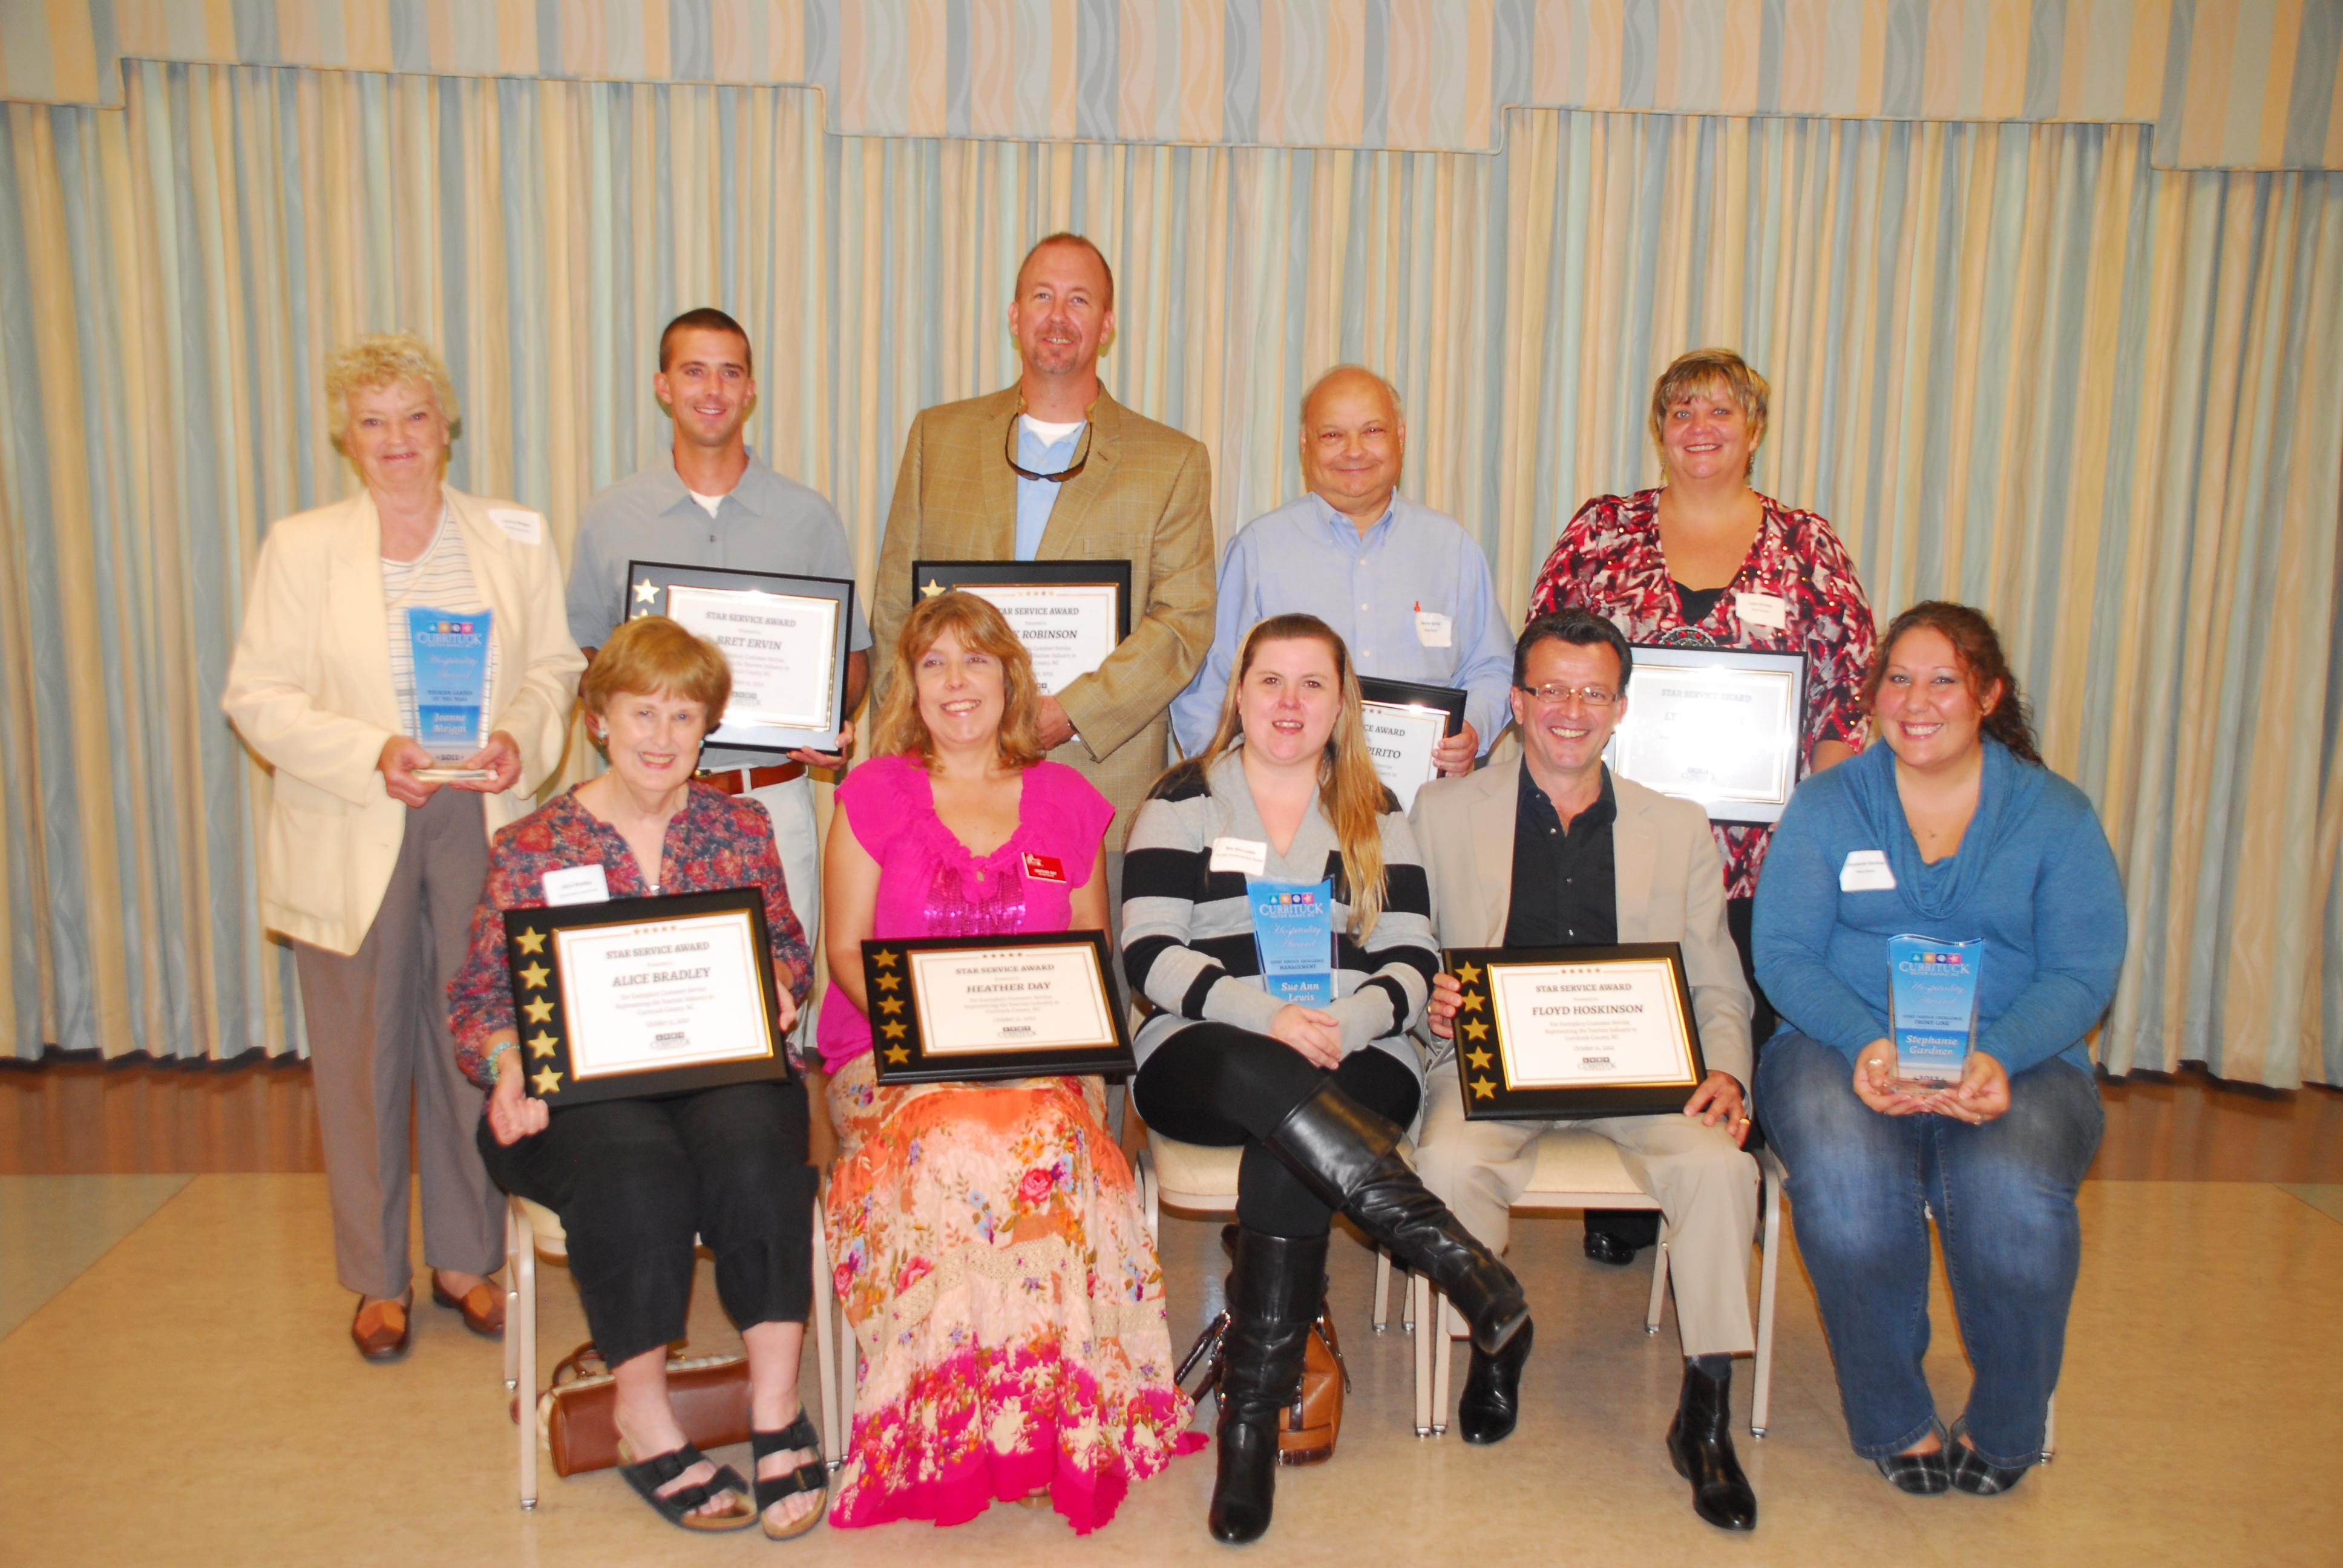 Hospitaity-Award-winners-2012